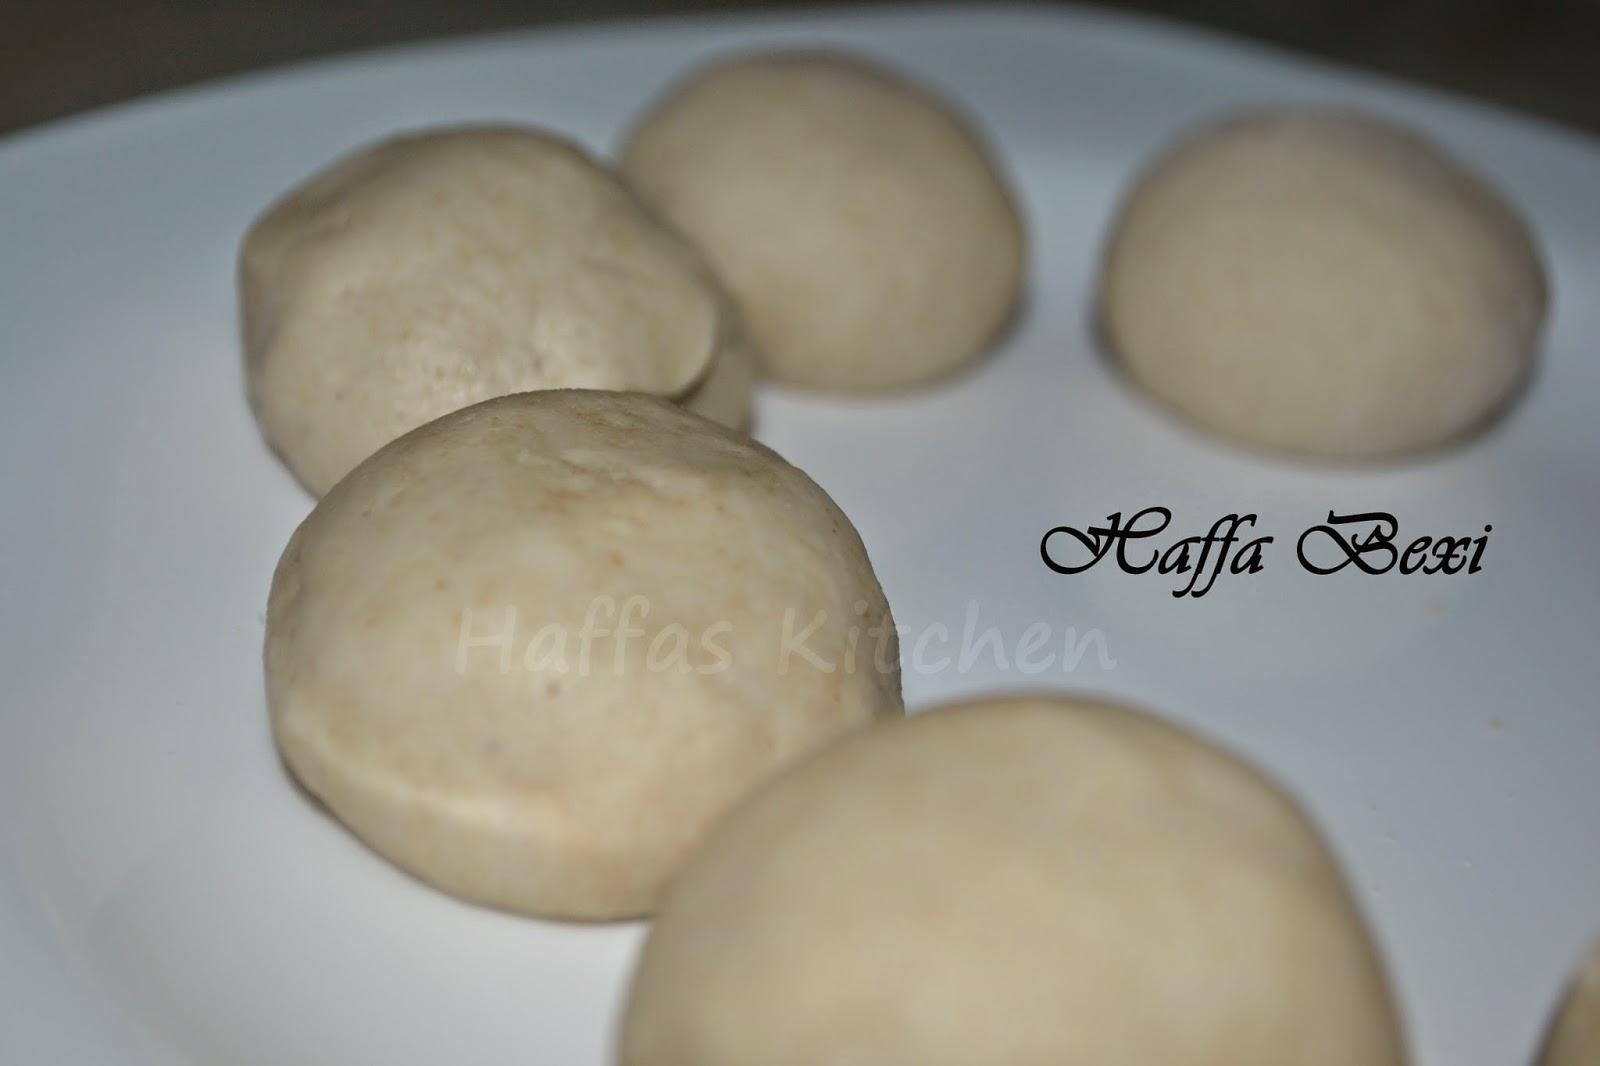 halwa puri recipe|halwa puri cholay recipe|Traditional pakistani breakfast recipe|Indian breakfast recipe| Traditional halwa poori| Halwa Poori bhaajia|how to make halwa puri|halwa puri chana recipe|halwa puri cholay recipe|recipe of halwa|indian halwa recipes|pakistani recipes|halwa poori chana recipe|